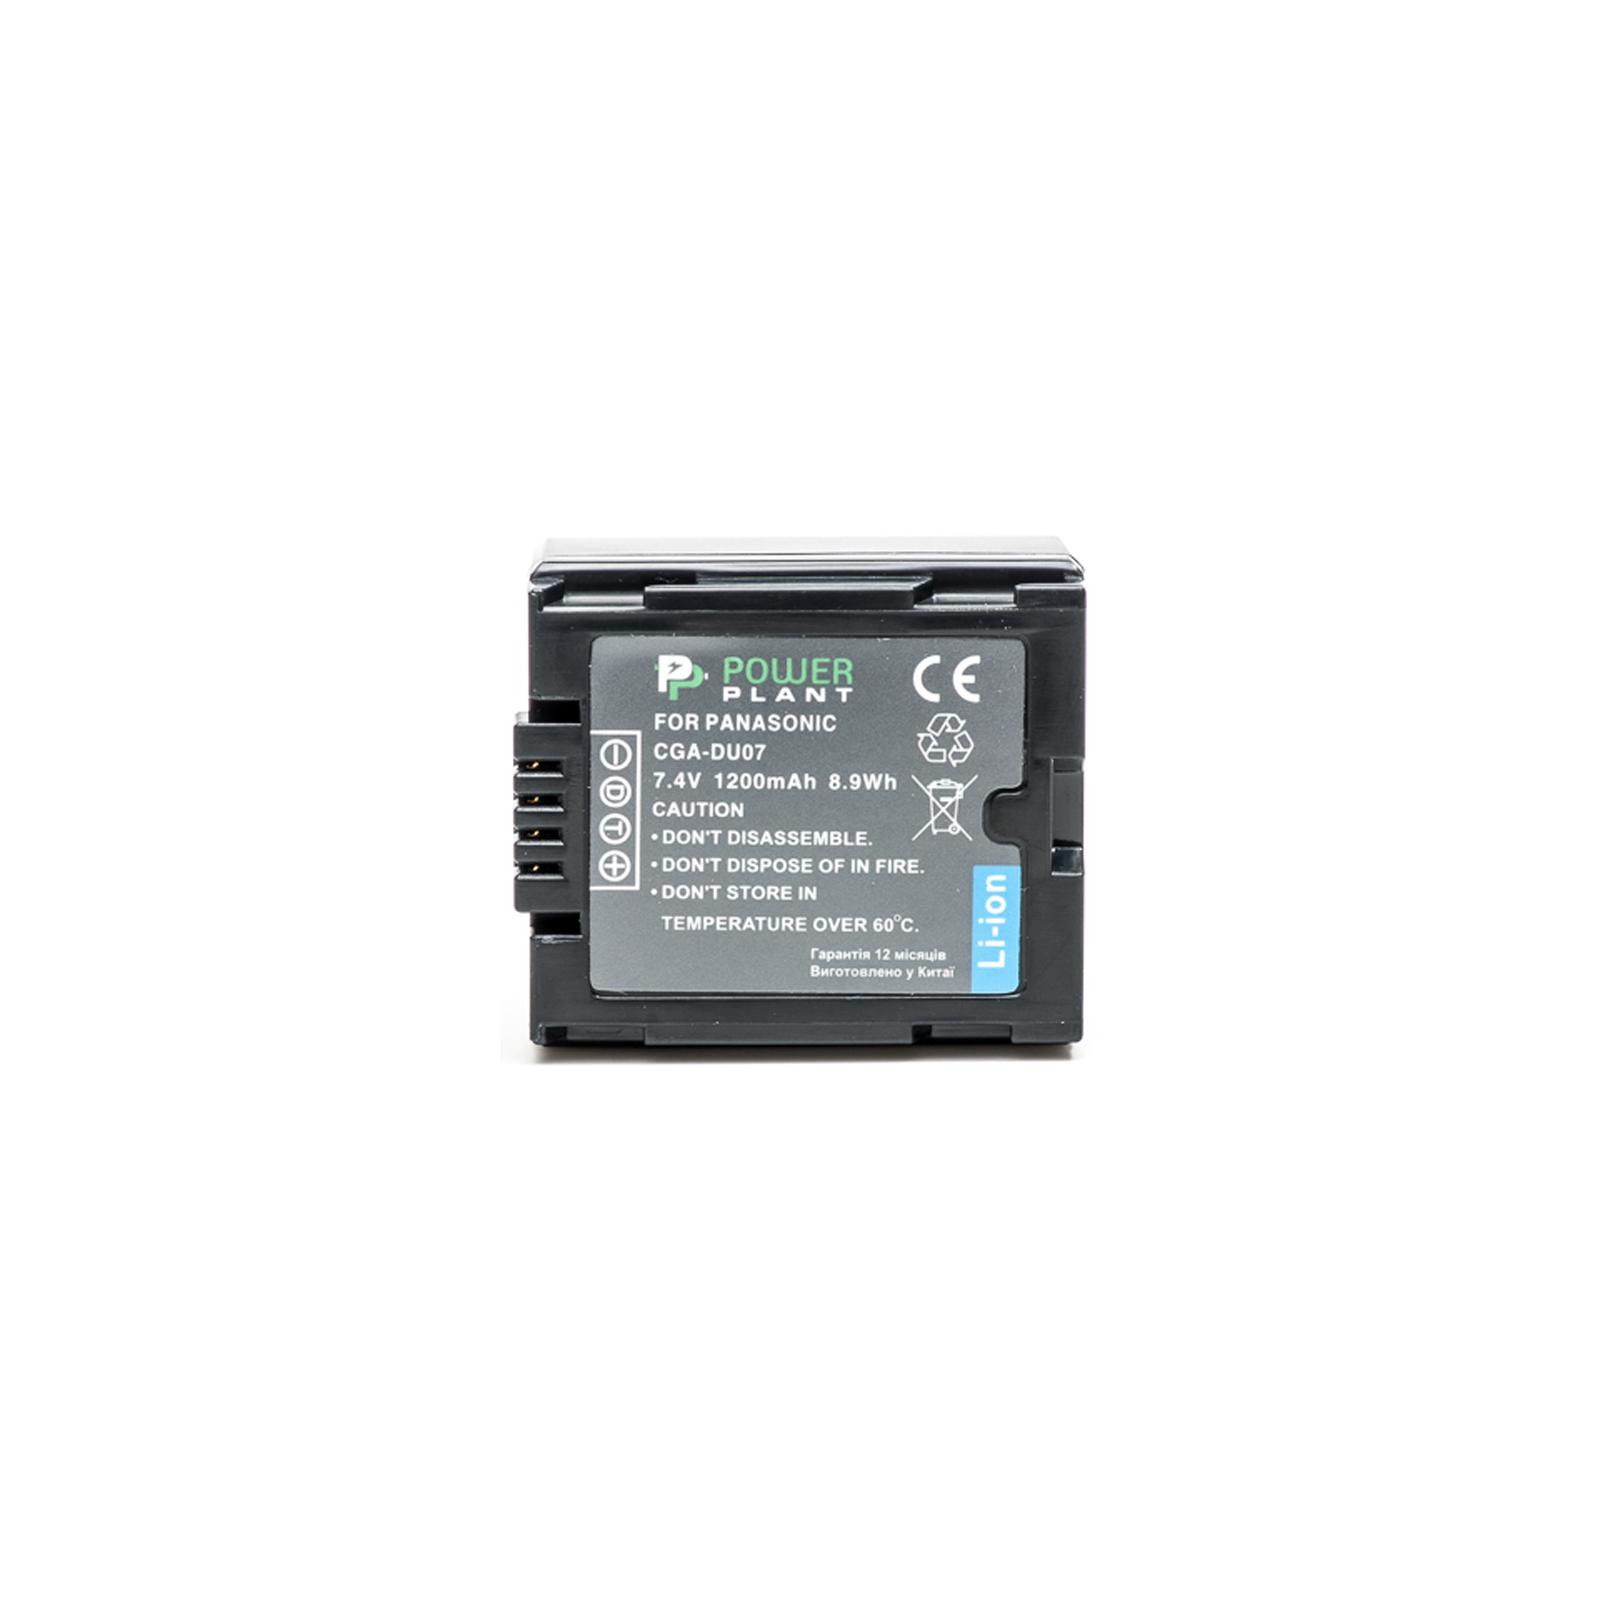 Аккумулятор к фото/видео PowerPlant Panasonic VW-VBD070, CGA-DU07 (DV00DV1339) изображение 2